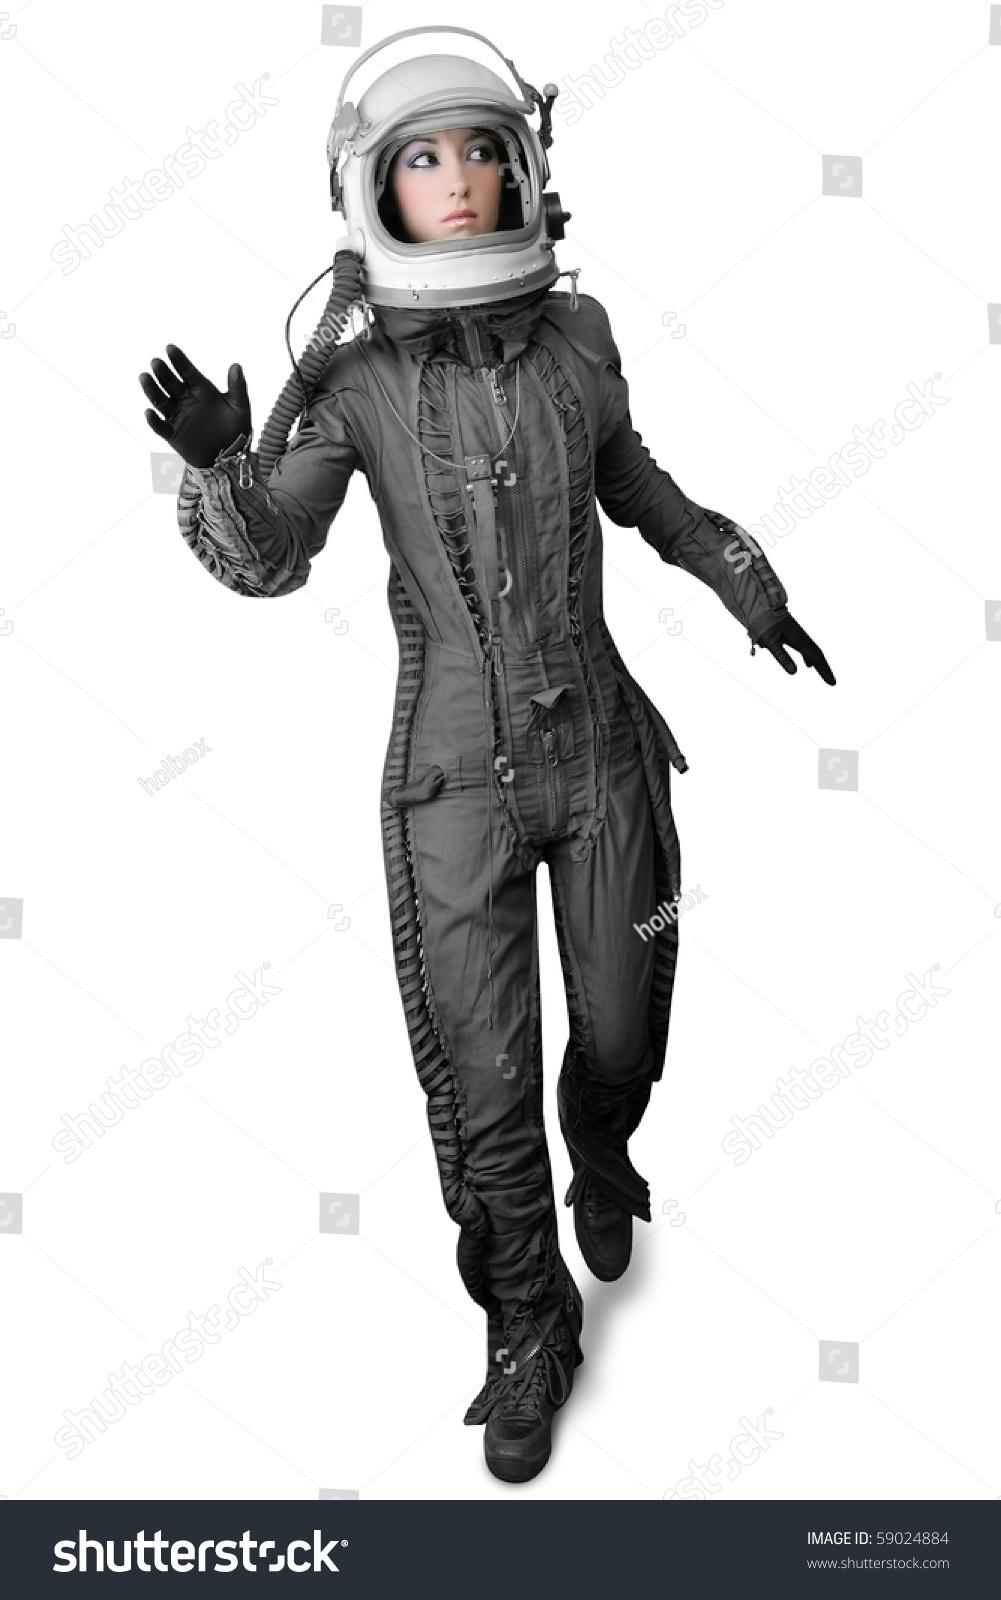 astronaut space fashion - photo #9